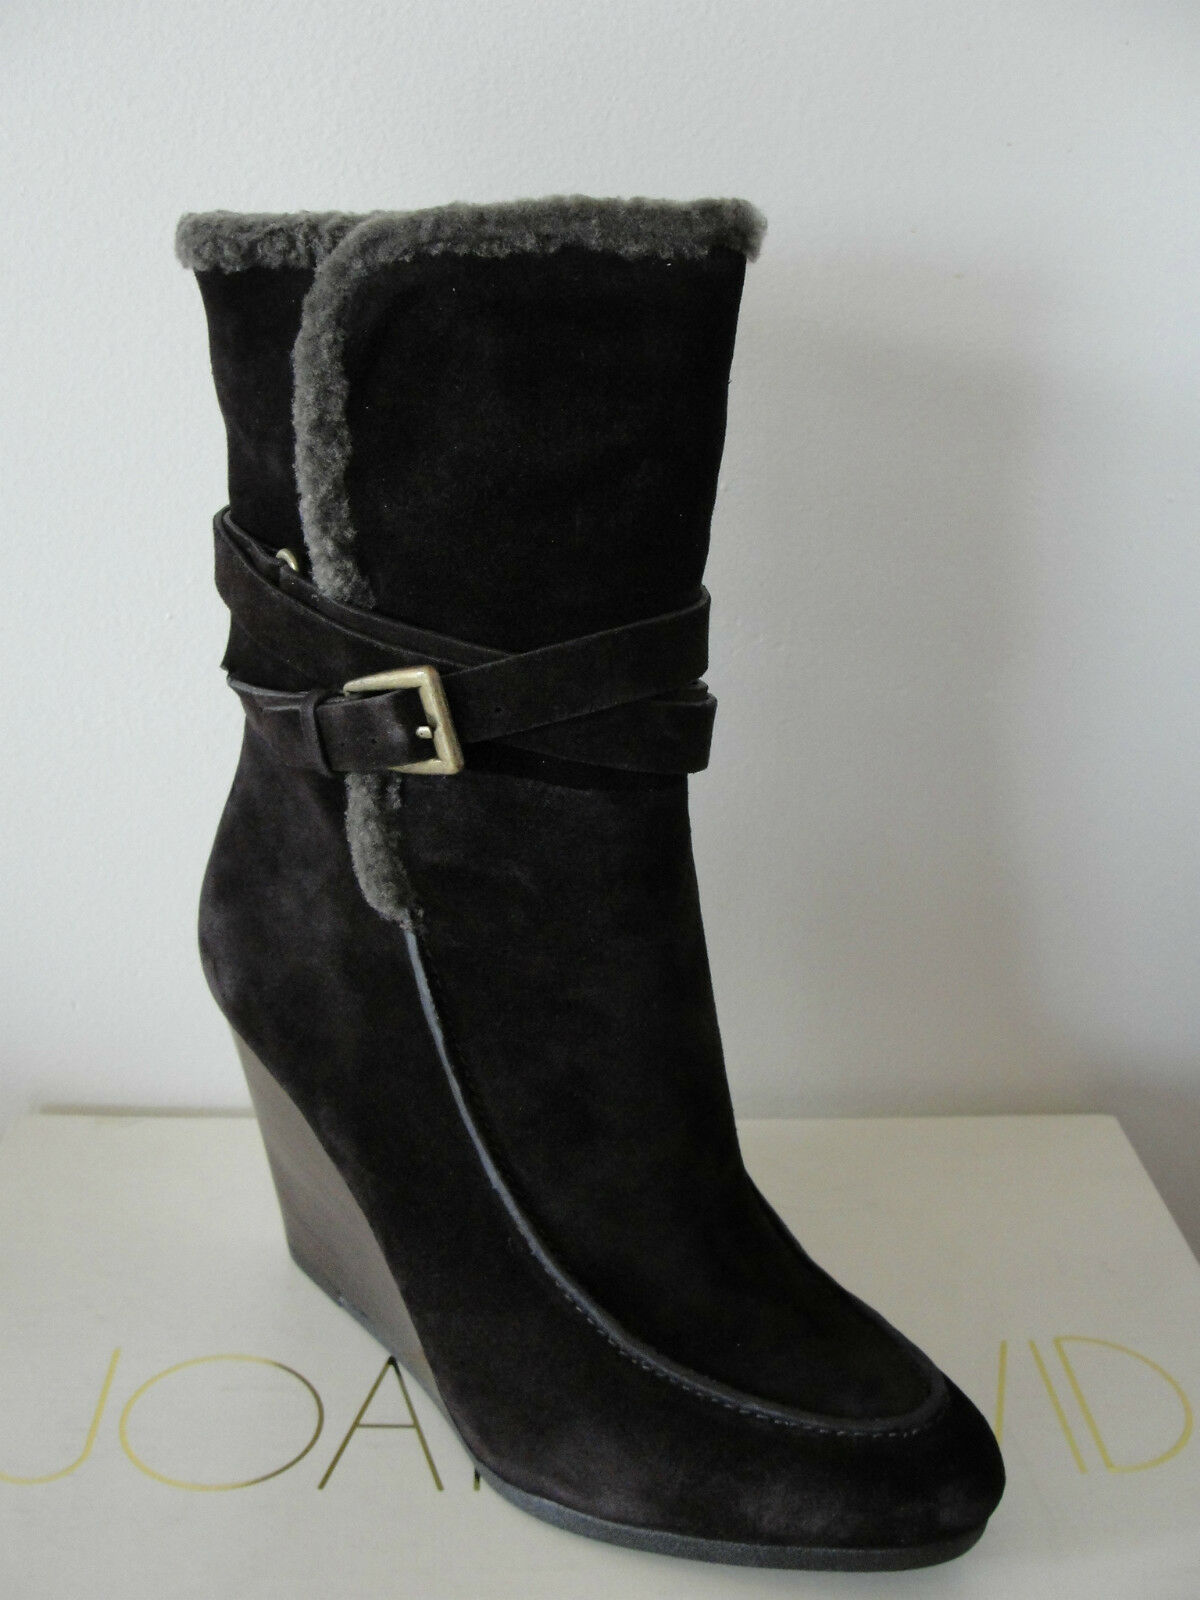 NIB  300 Joan & David Florita Suede Ankle botas botas botas Dark marrón 9M 5a5584